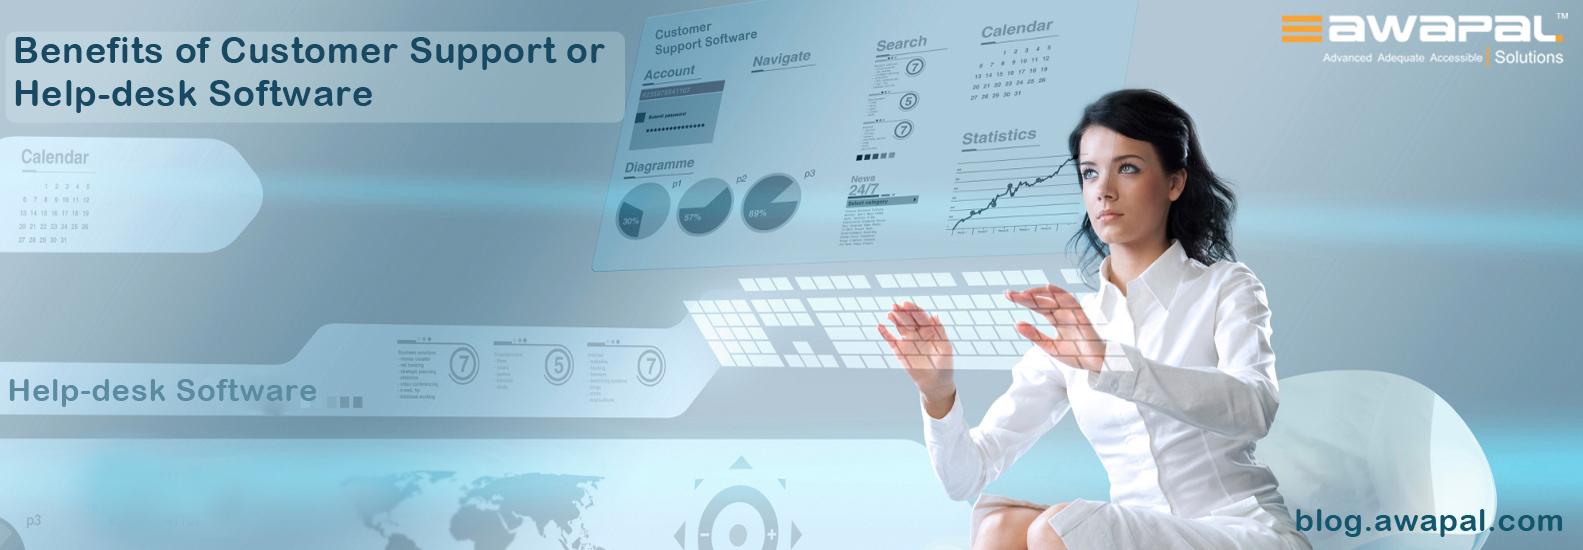 Benefits-of-Customer-Support-Software-Help-desk-Software